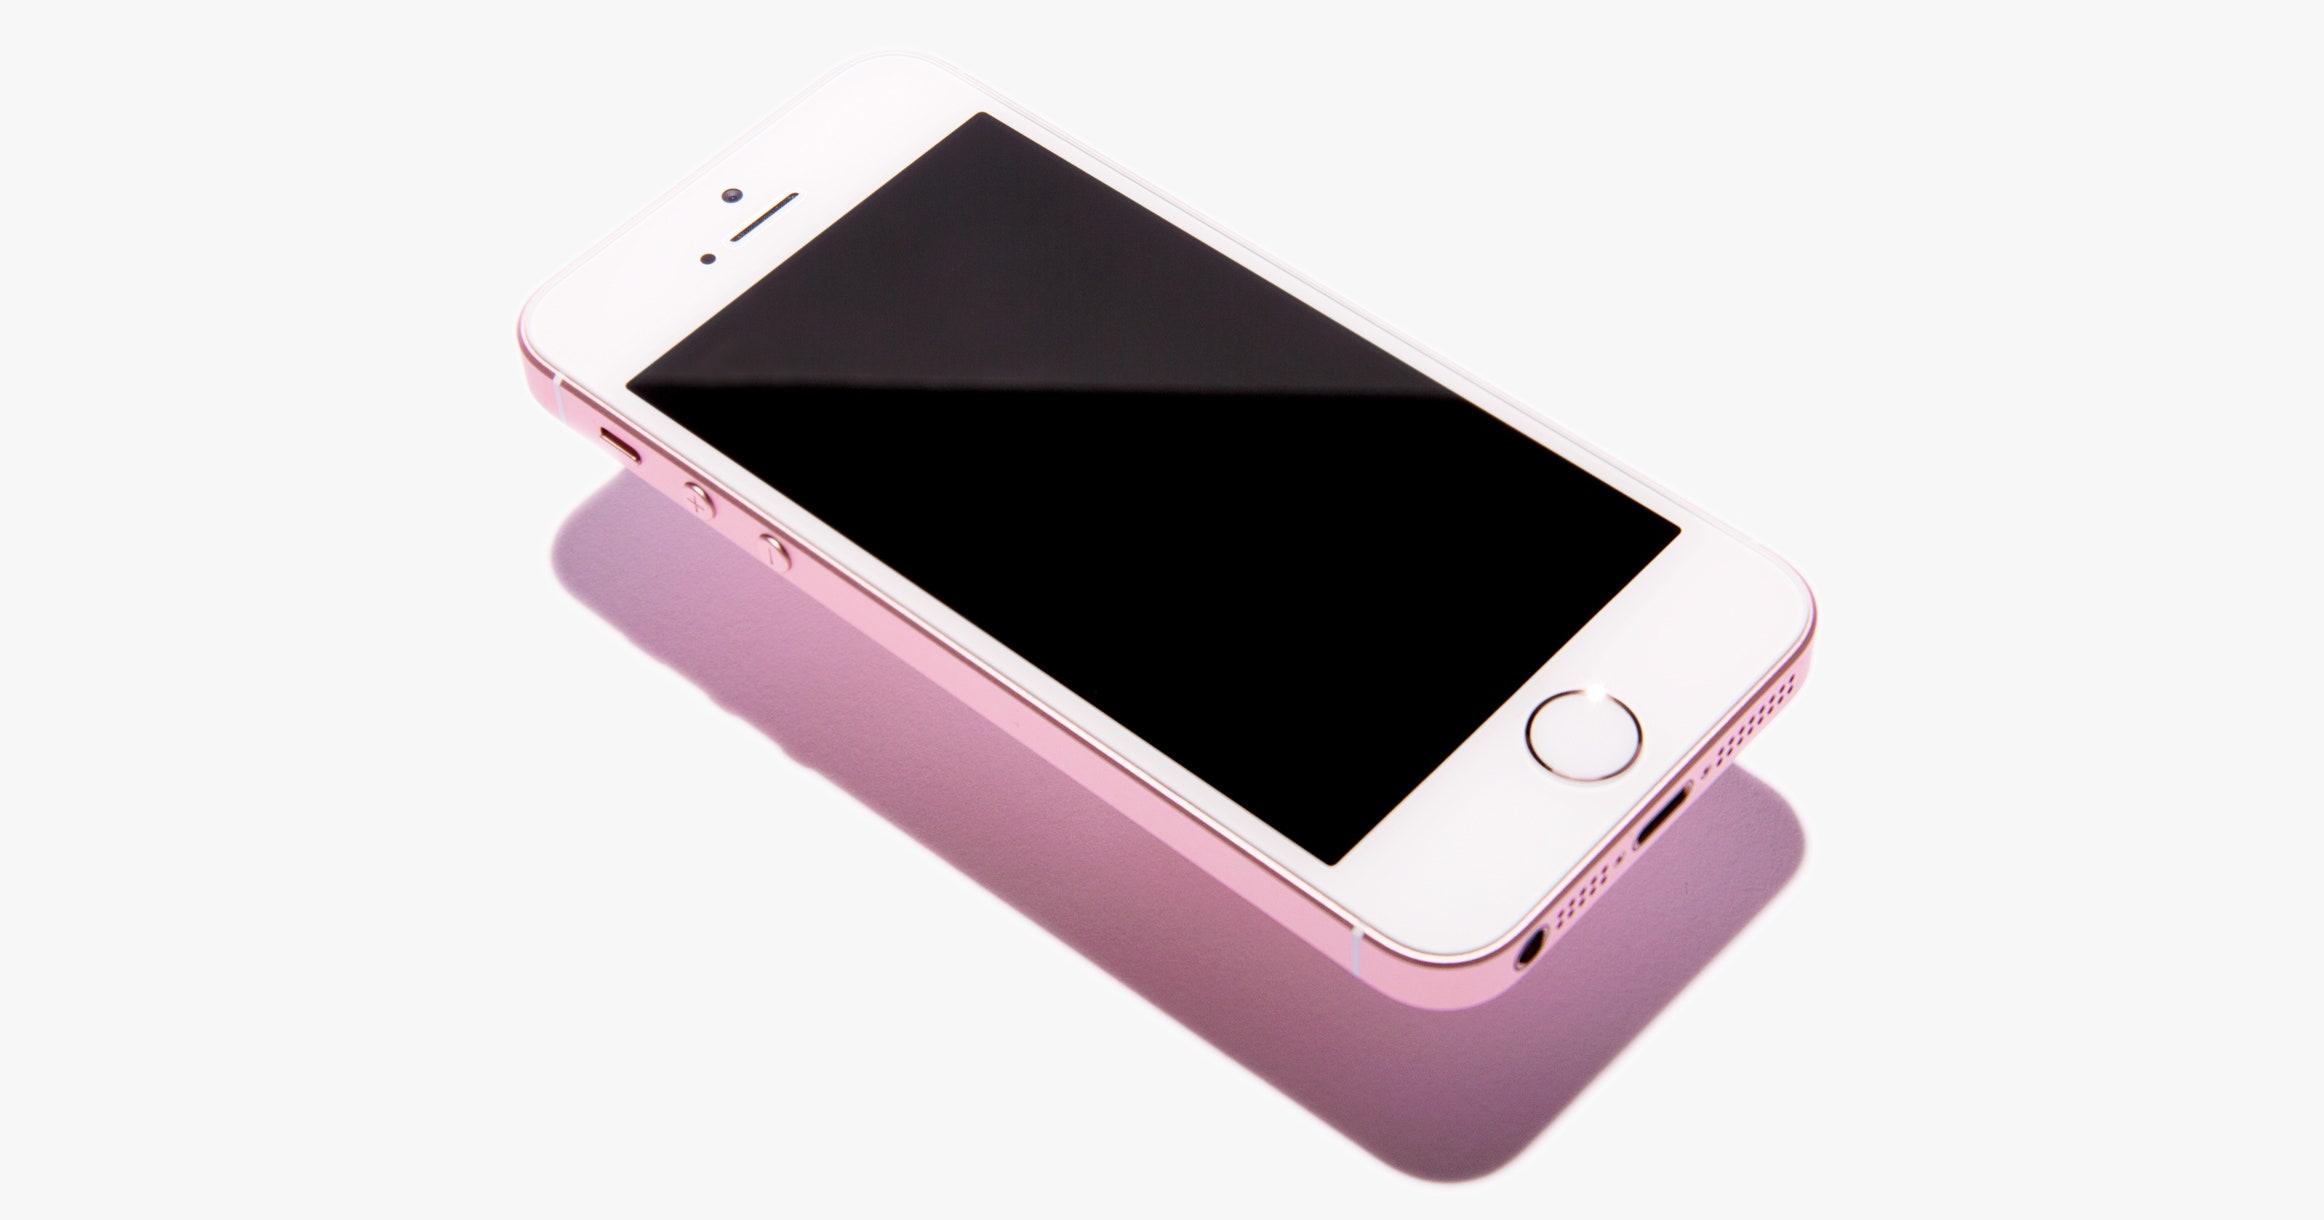 Apple iPhone SE (bez blokady SIM) - SOLD OUT